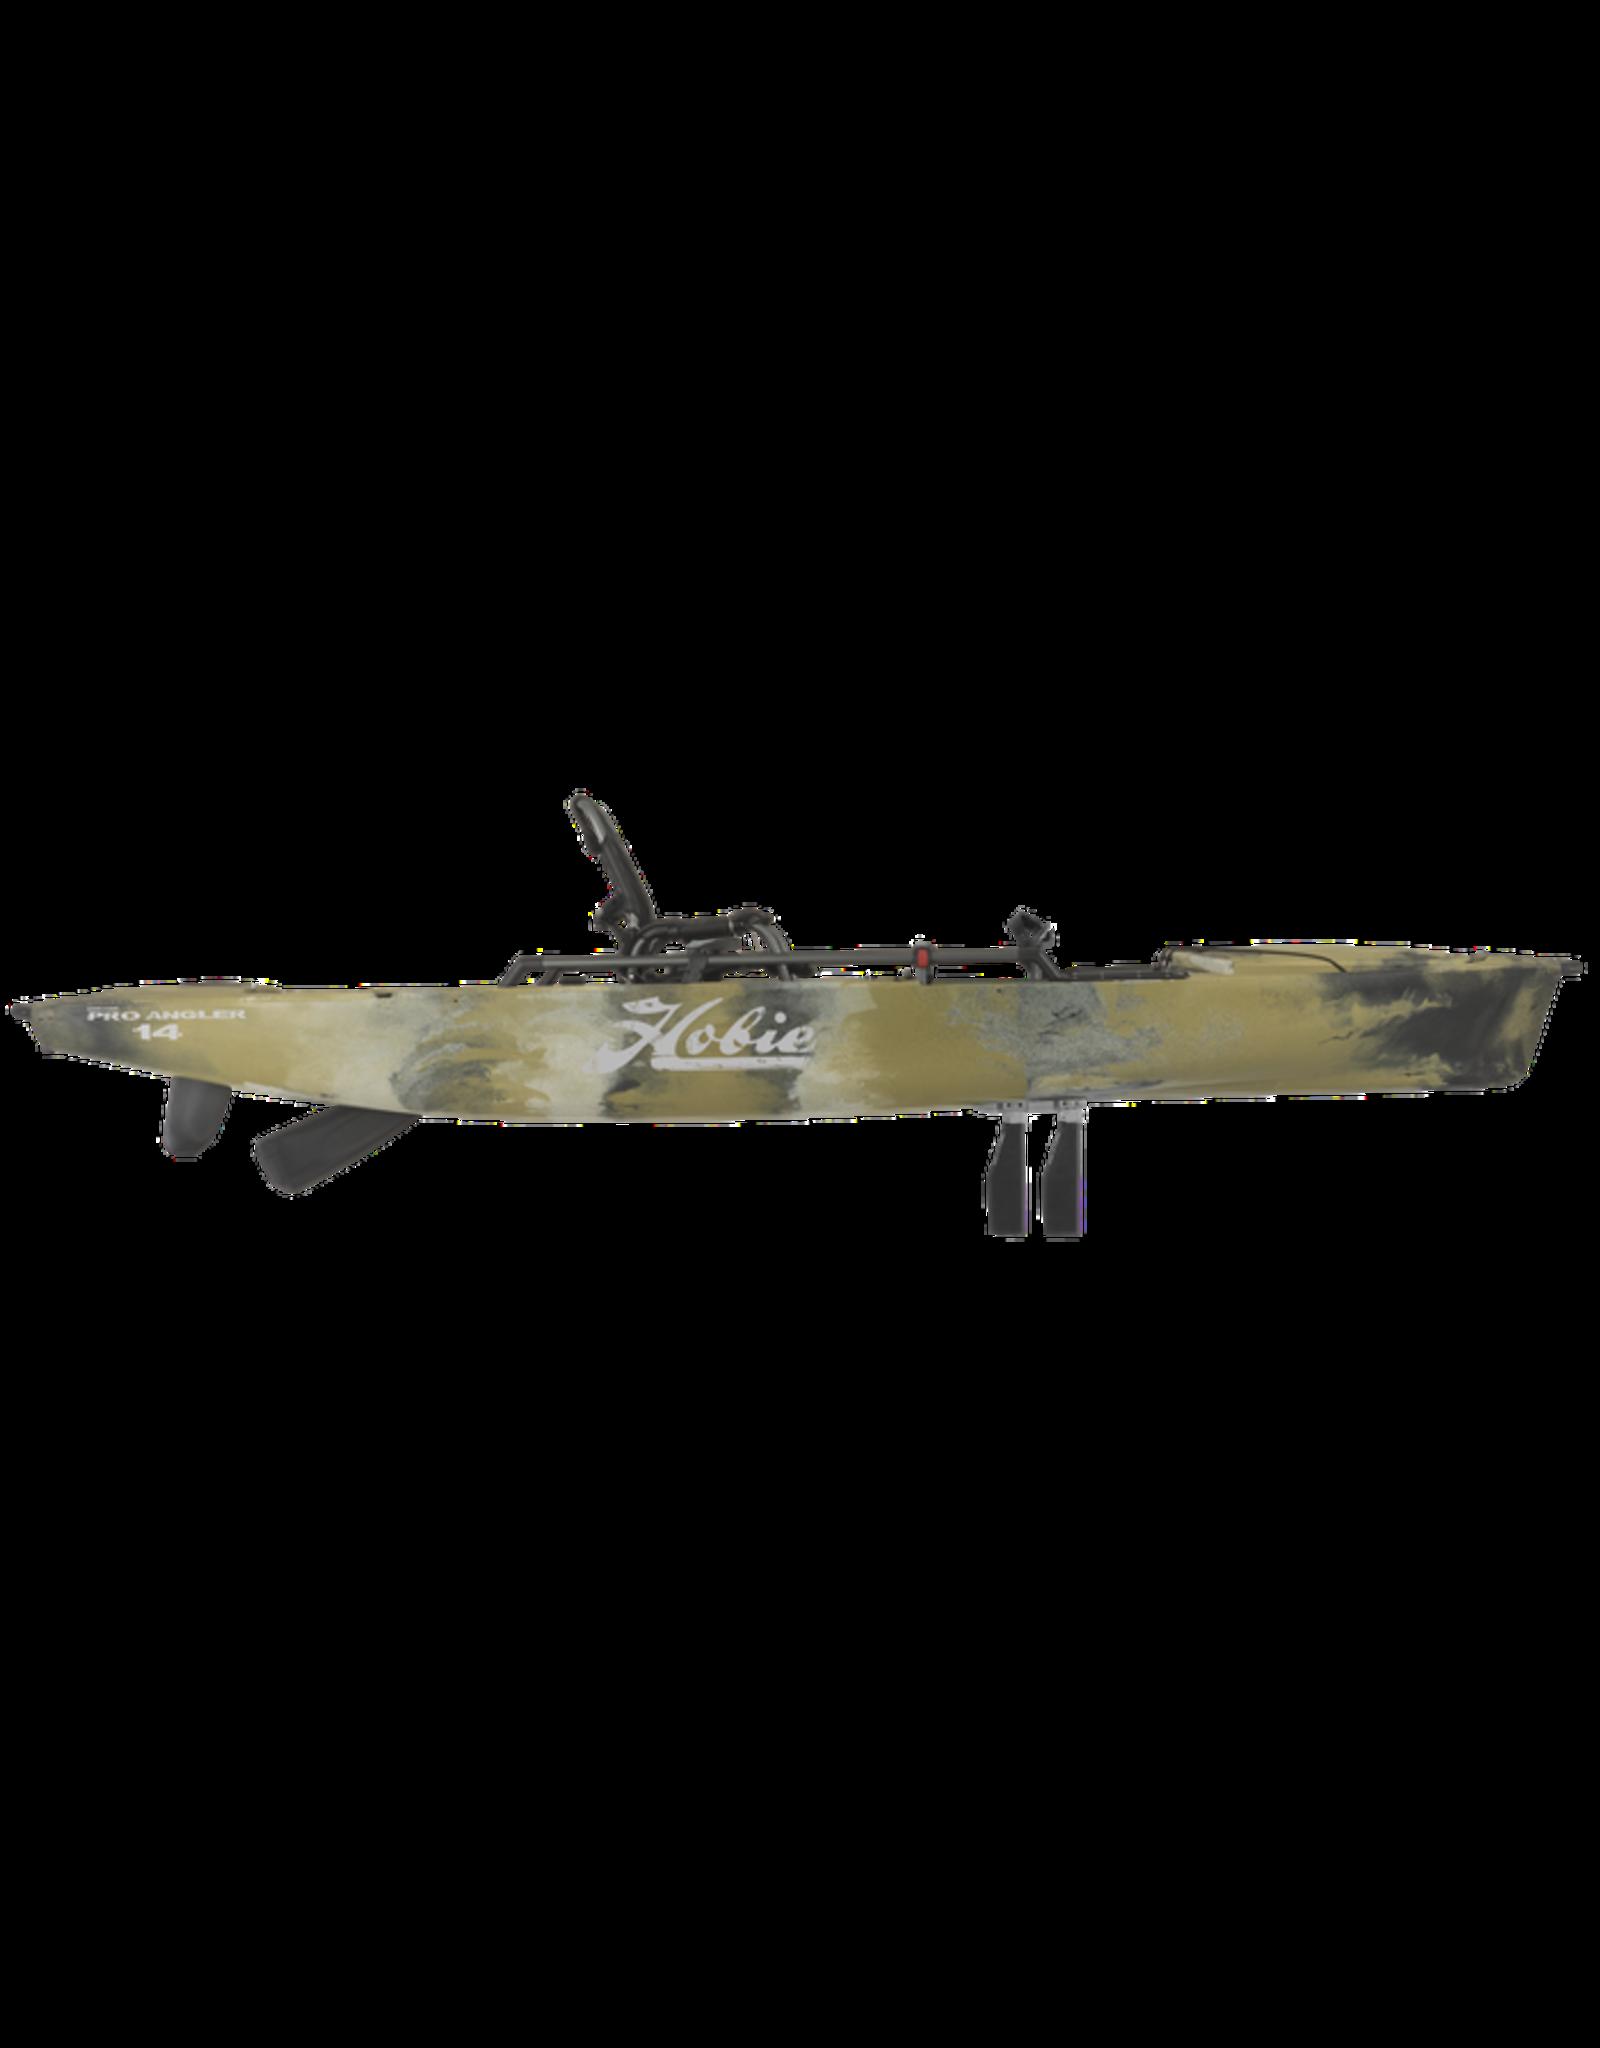 Hobie Hobie kayak Pro Angler 14 MirageDrive 180 Turbo Kick-Up Fin Camo